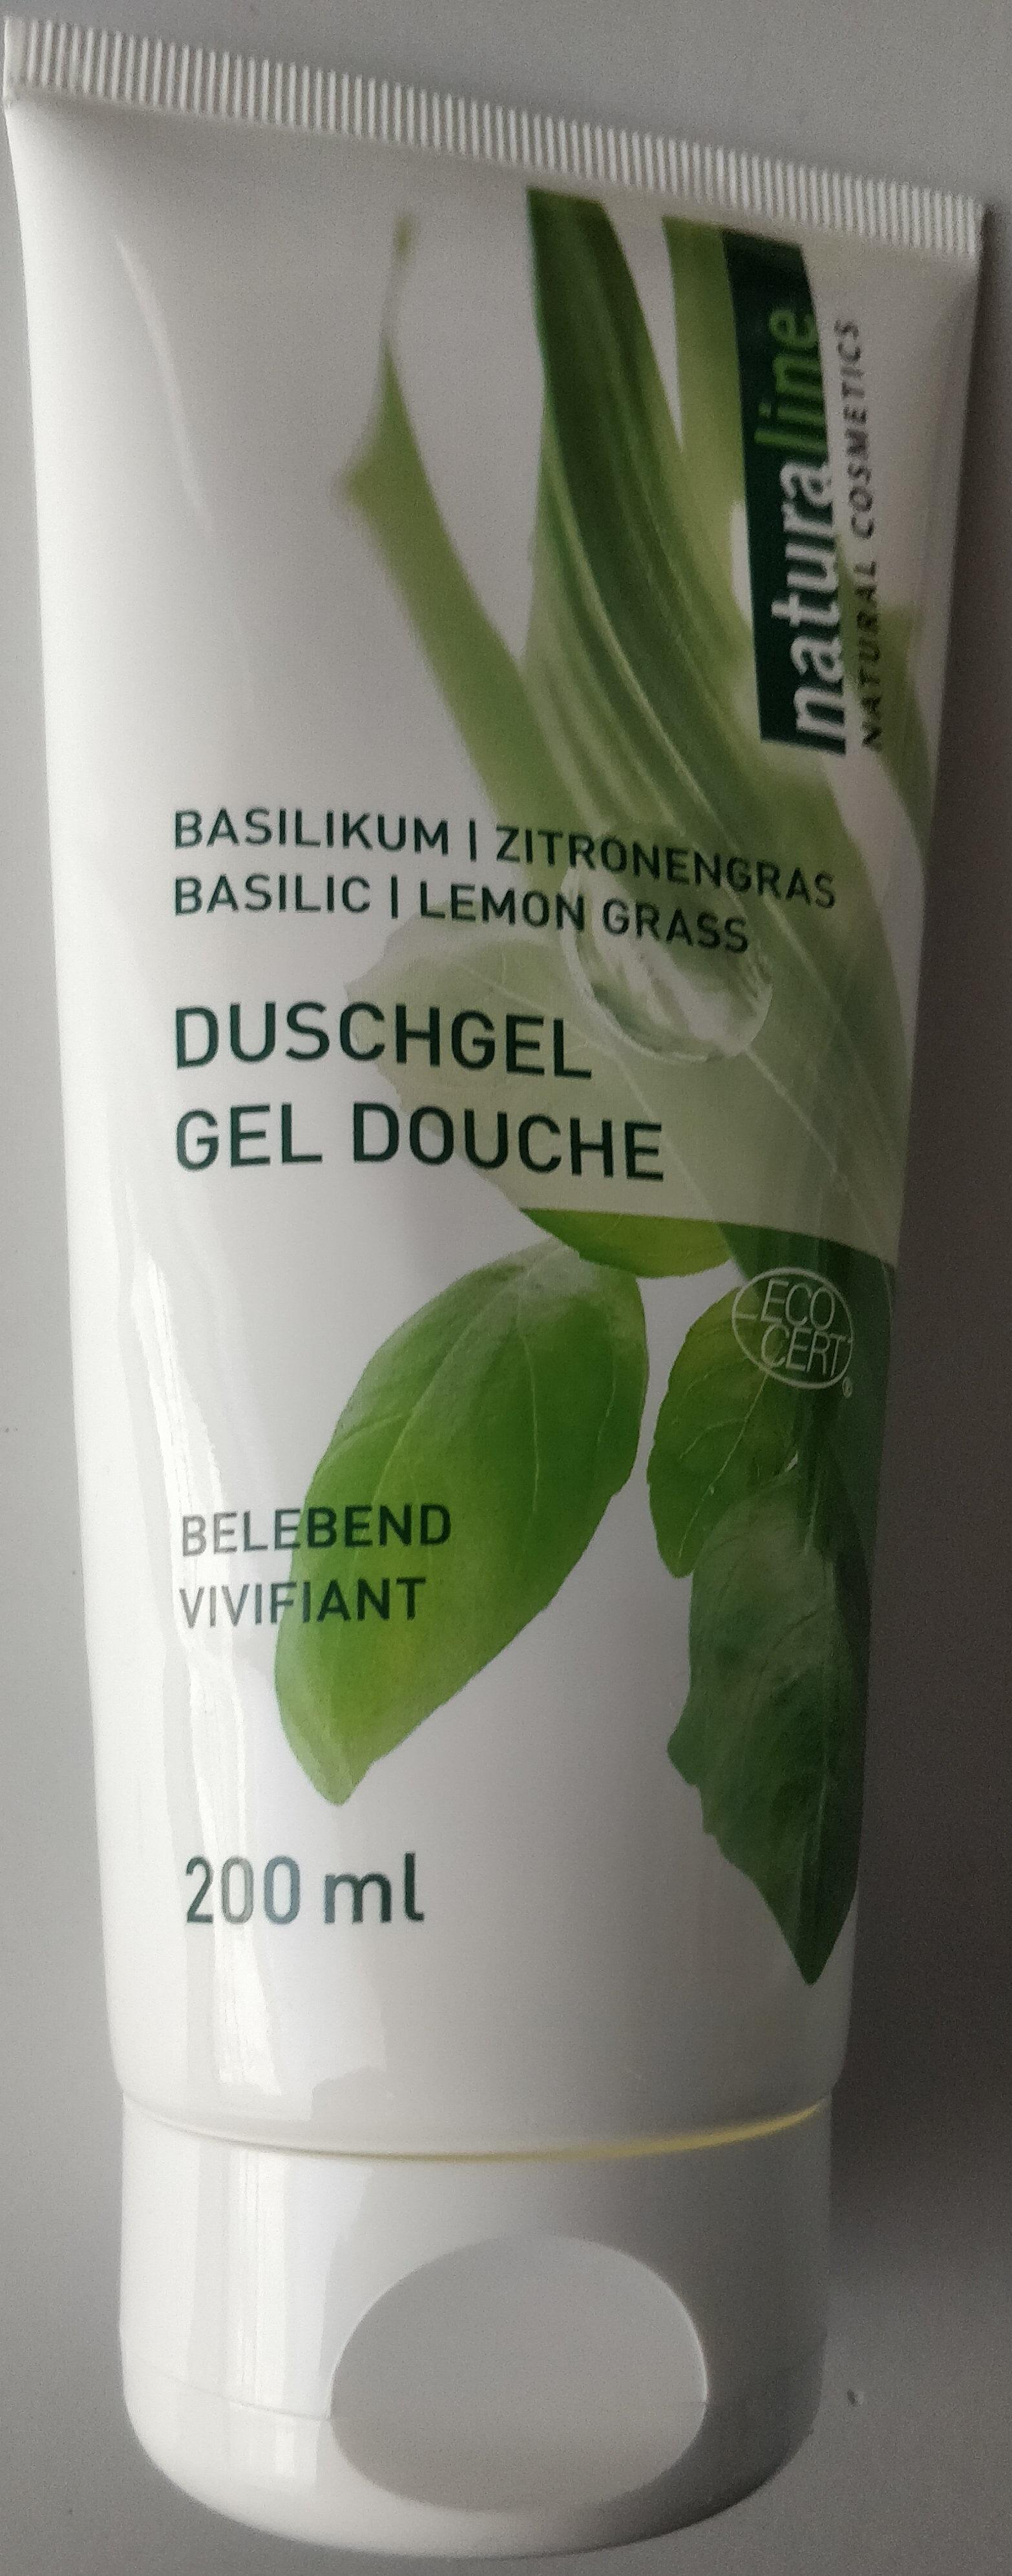 Duschgel Gel Dousche - Produit - it